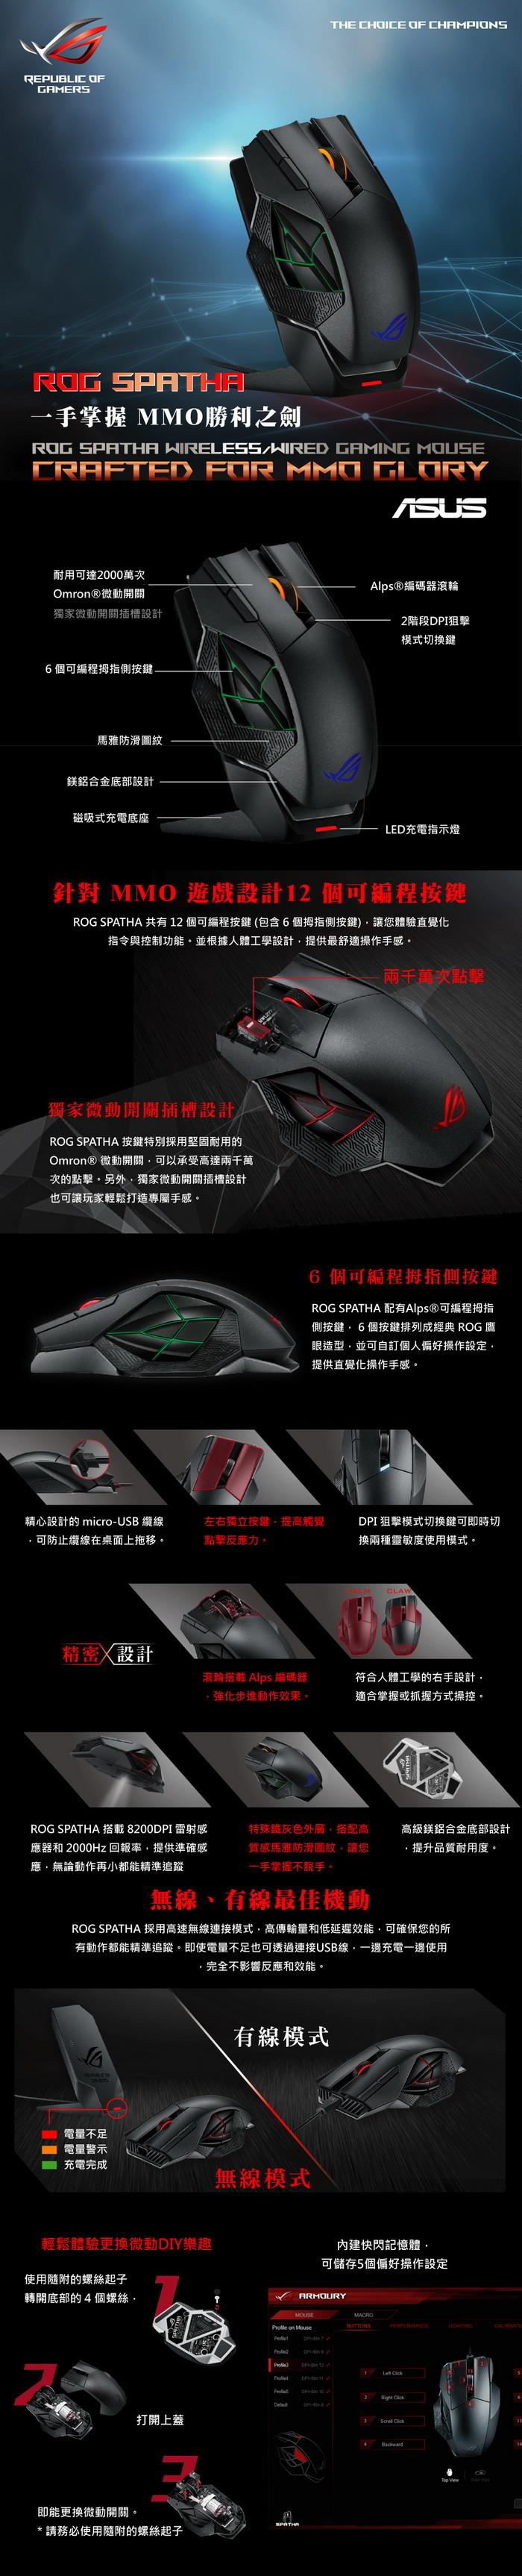 ASUS 華碩ROG SPATHA 無線雙模電競滑鼠|ASUS|Her森森購物網